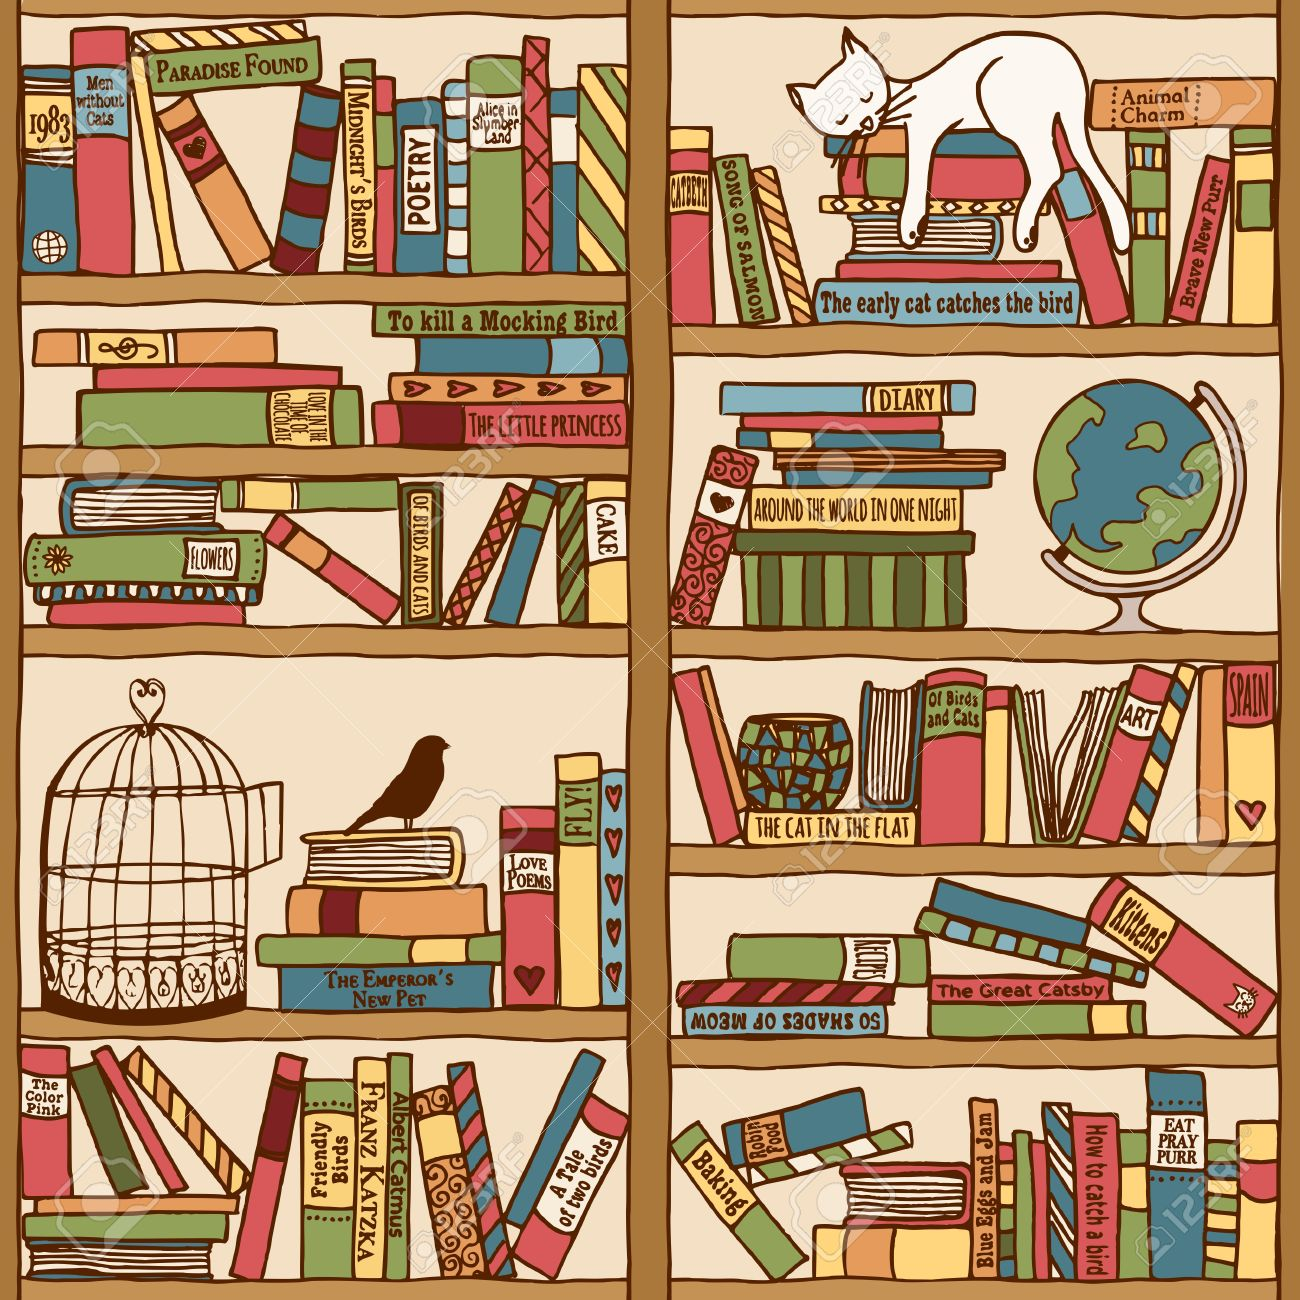 Bücherregal gezeichnet  Bücherregal Gezeichnet | ambiznes.com